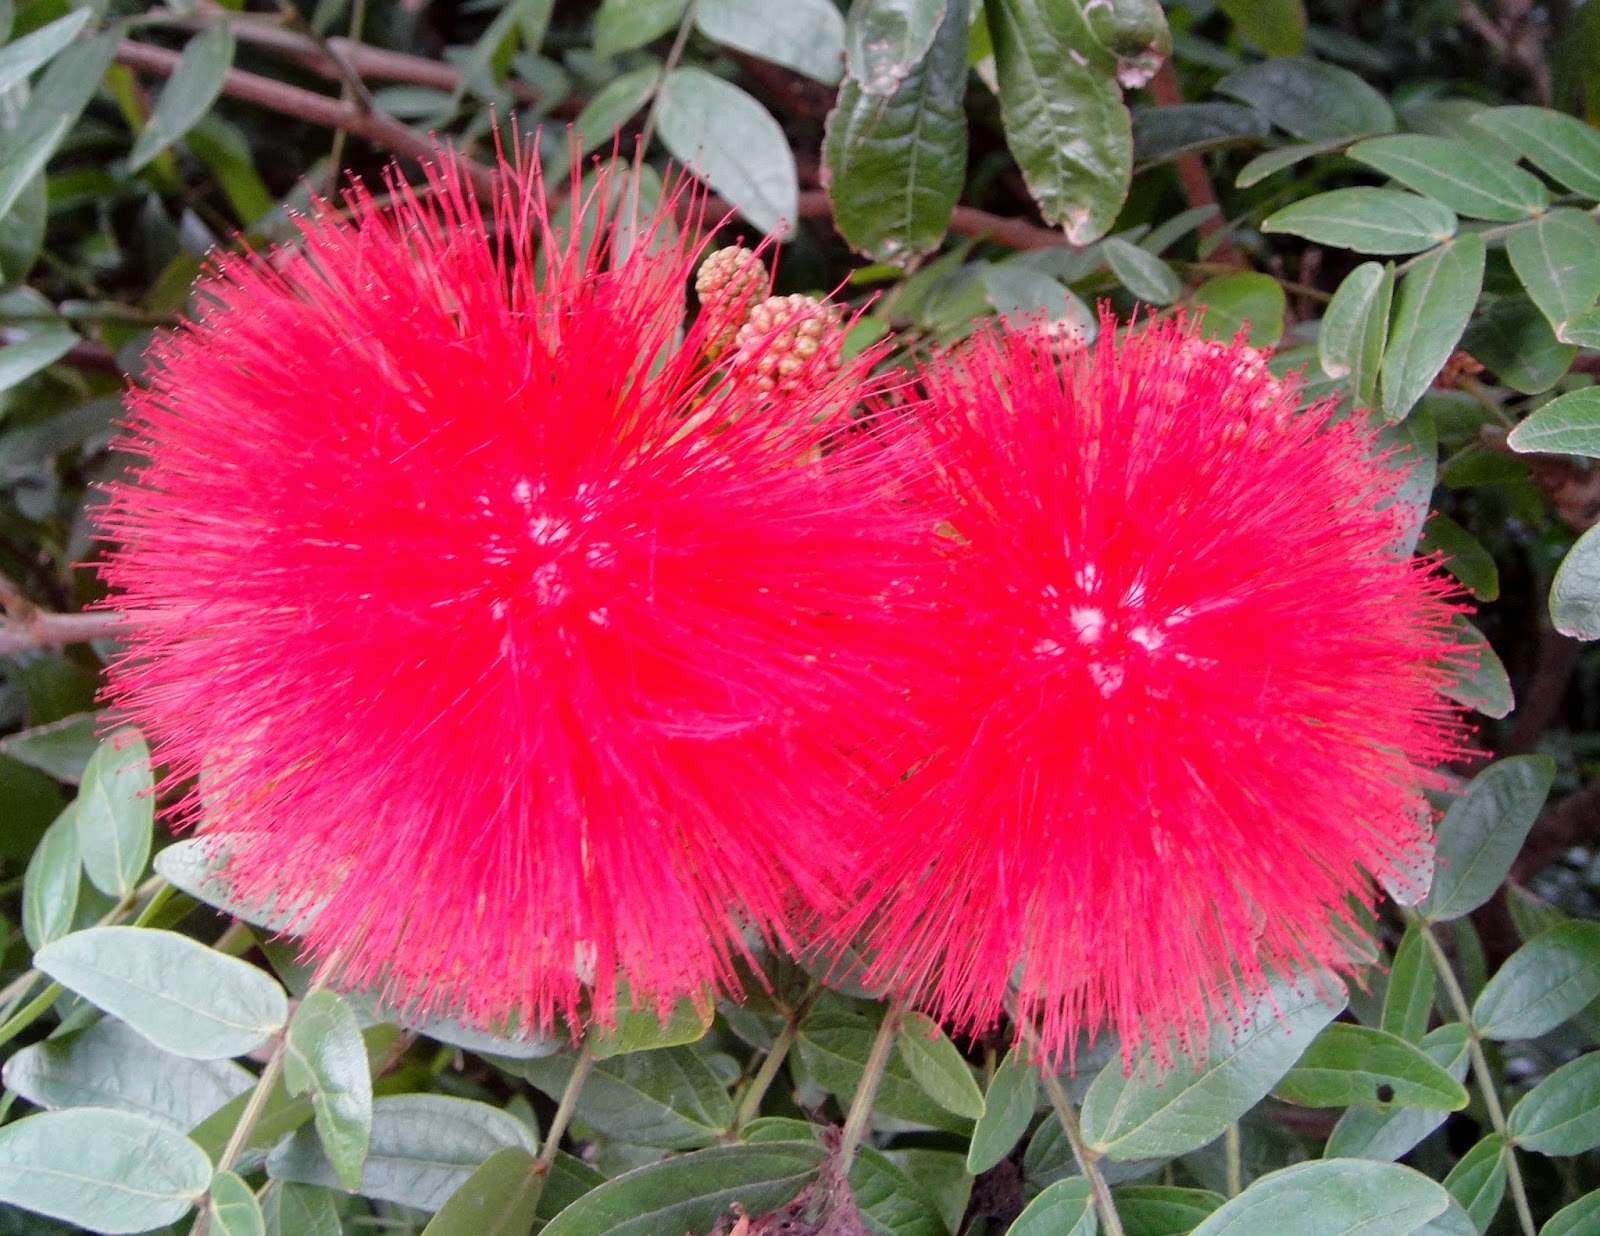 DWAN雲之端: 美洲合歡---與紅粉撲花還是不太一樣喔,圖片和美工照片 - 178-7-021.jpg